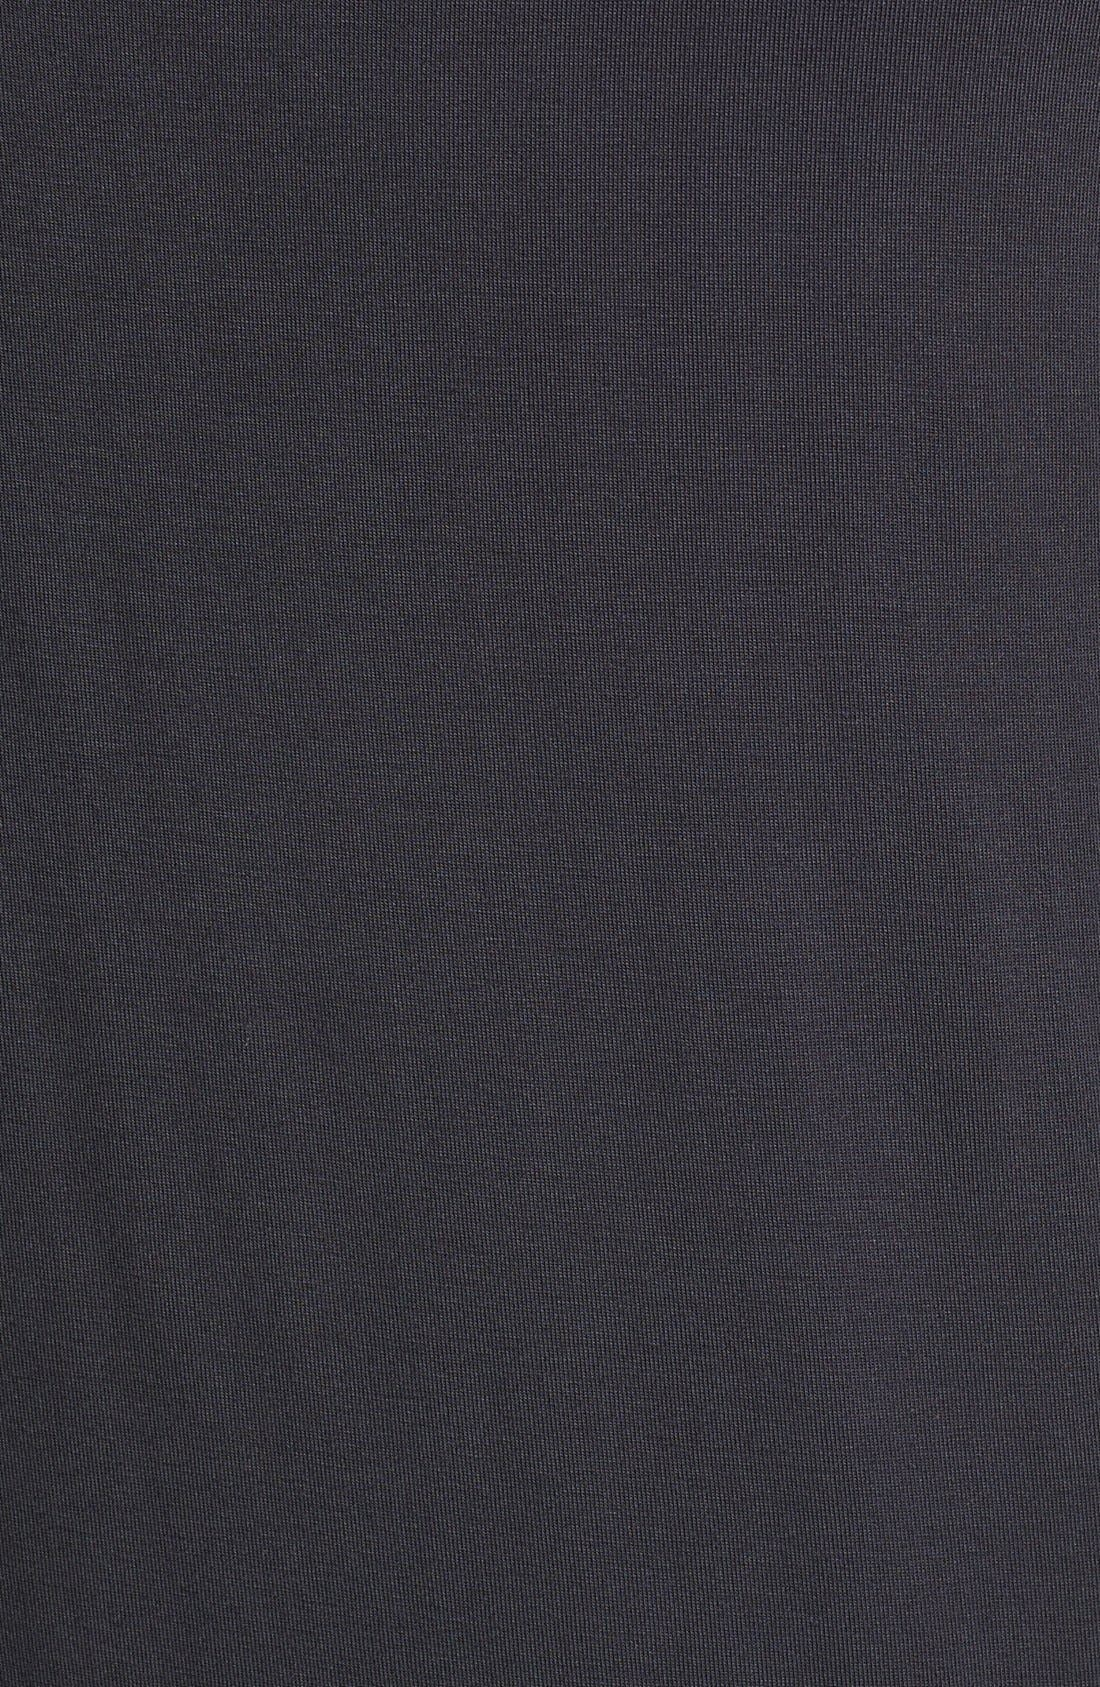 Alternate Image 3  - Nike Long Sleeve Logo Tee